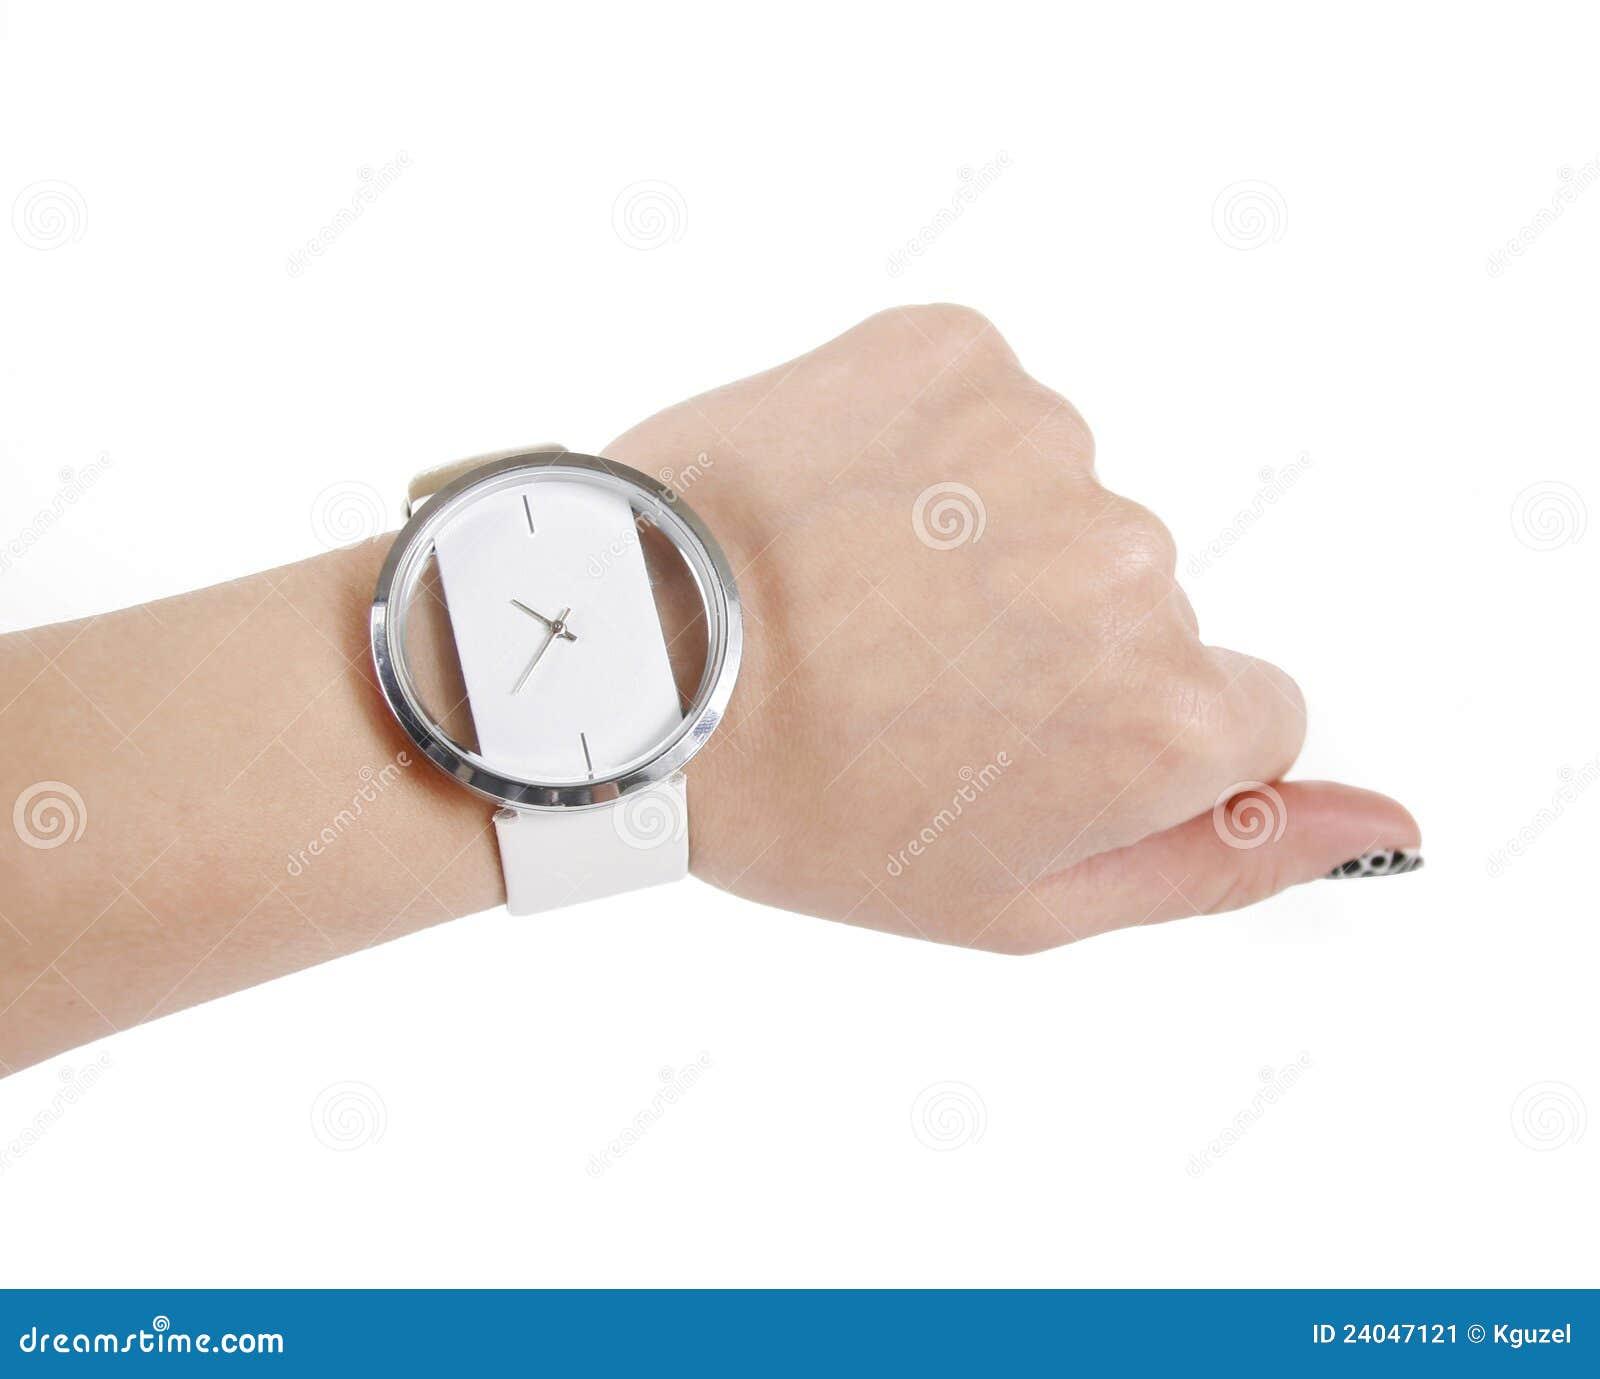 Trendy Wrist Watch On Woman Hand Stock Image - Image: 24047121